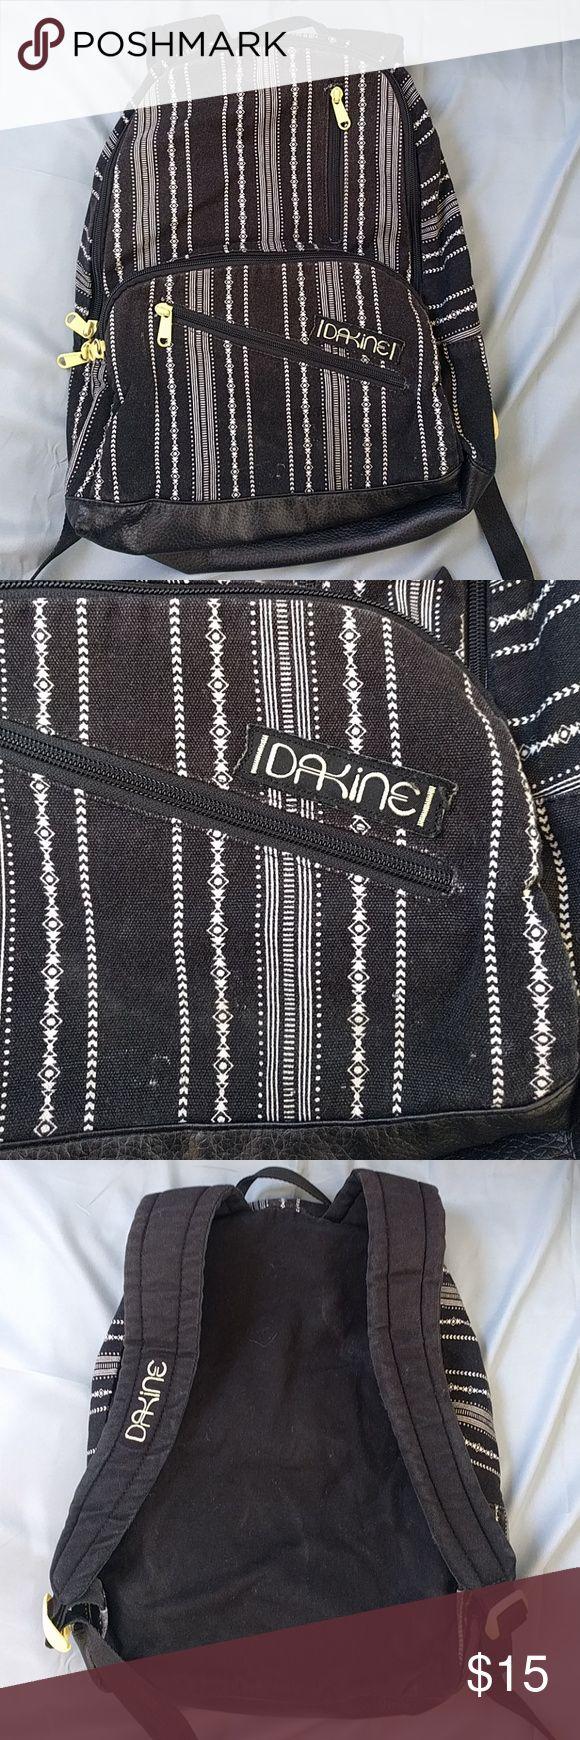 Dakine black and white pattern striped backpack Black and white patterned backpack with faux leather bottom, used six times Dakine Bags Backpacks